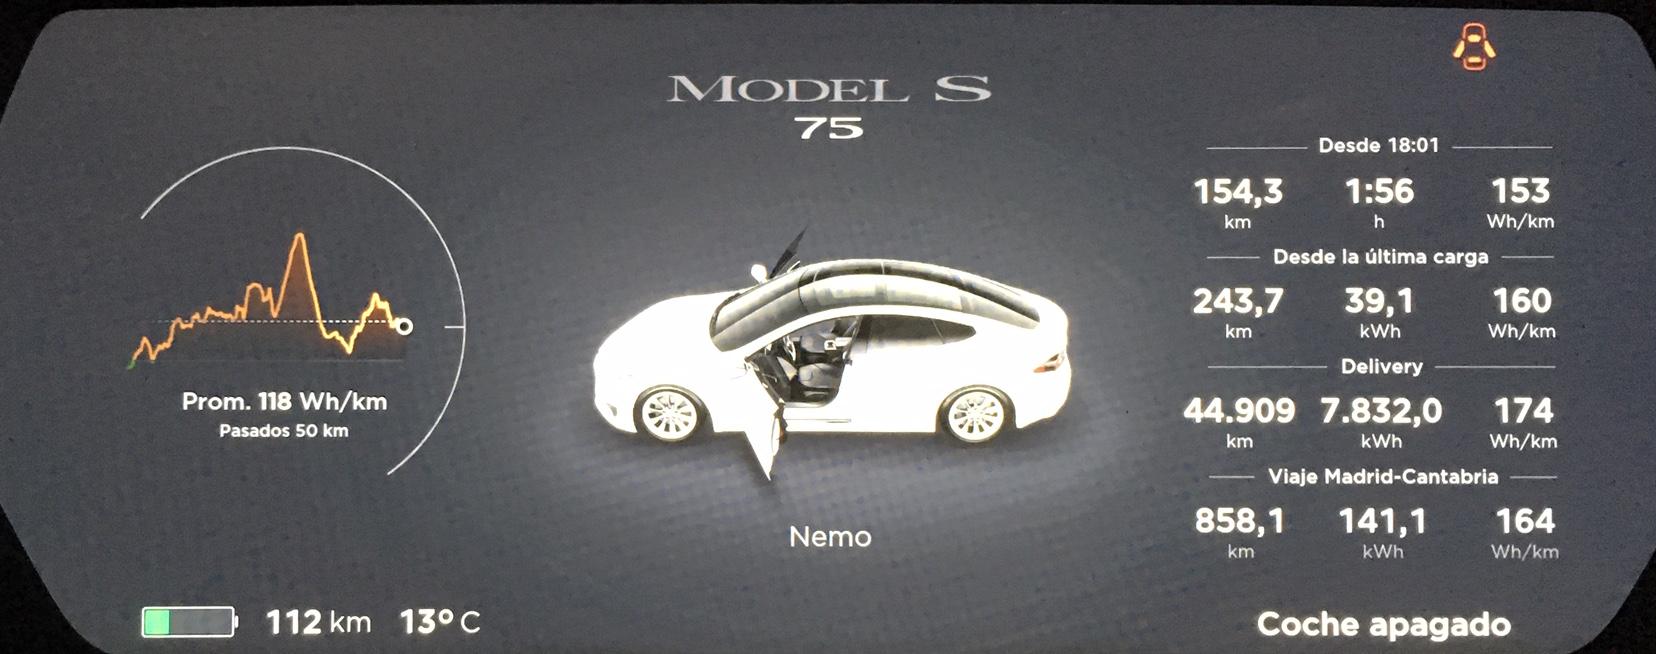 Viaje Cantabria-Madrid en Tesla Model S 75. Llegada a Madrid.